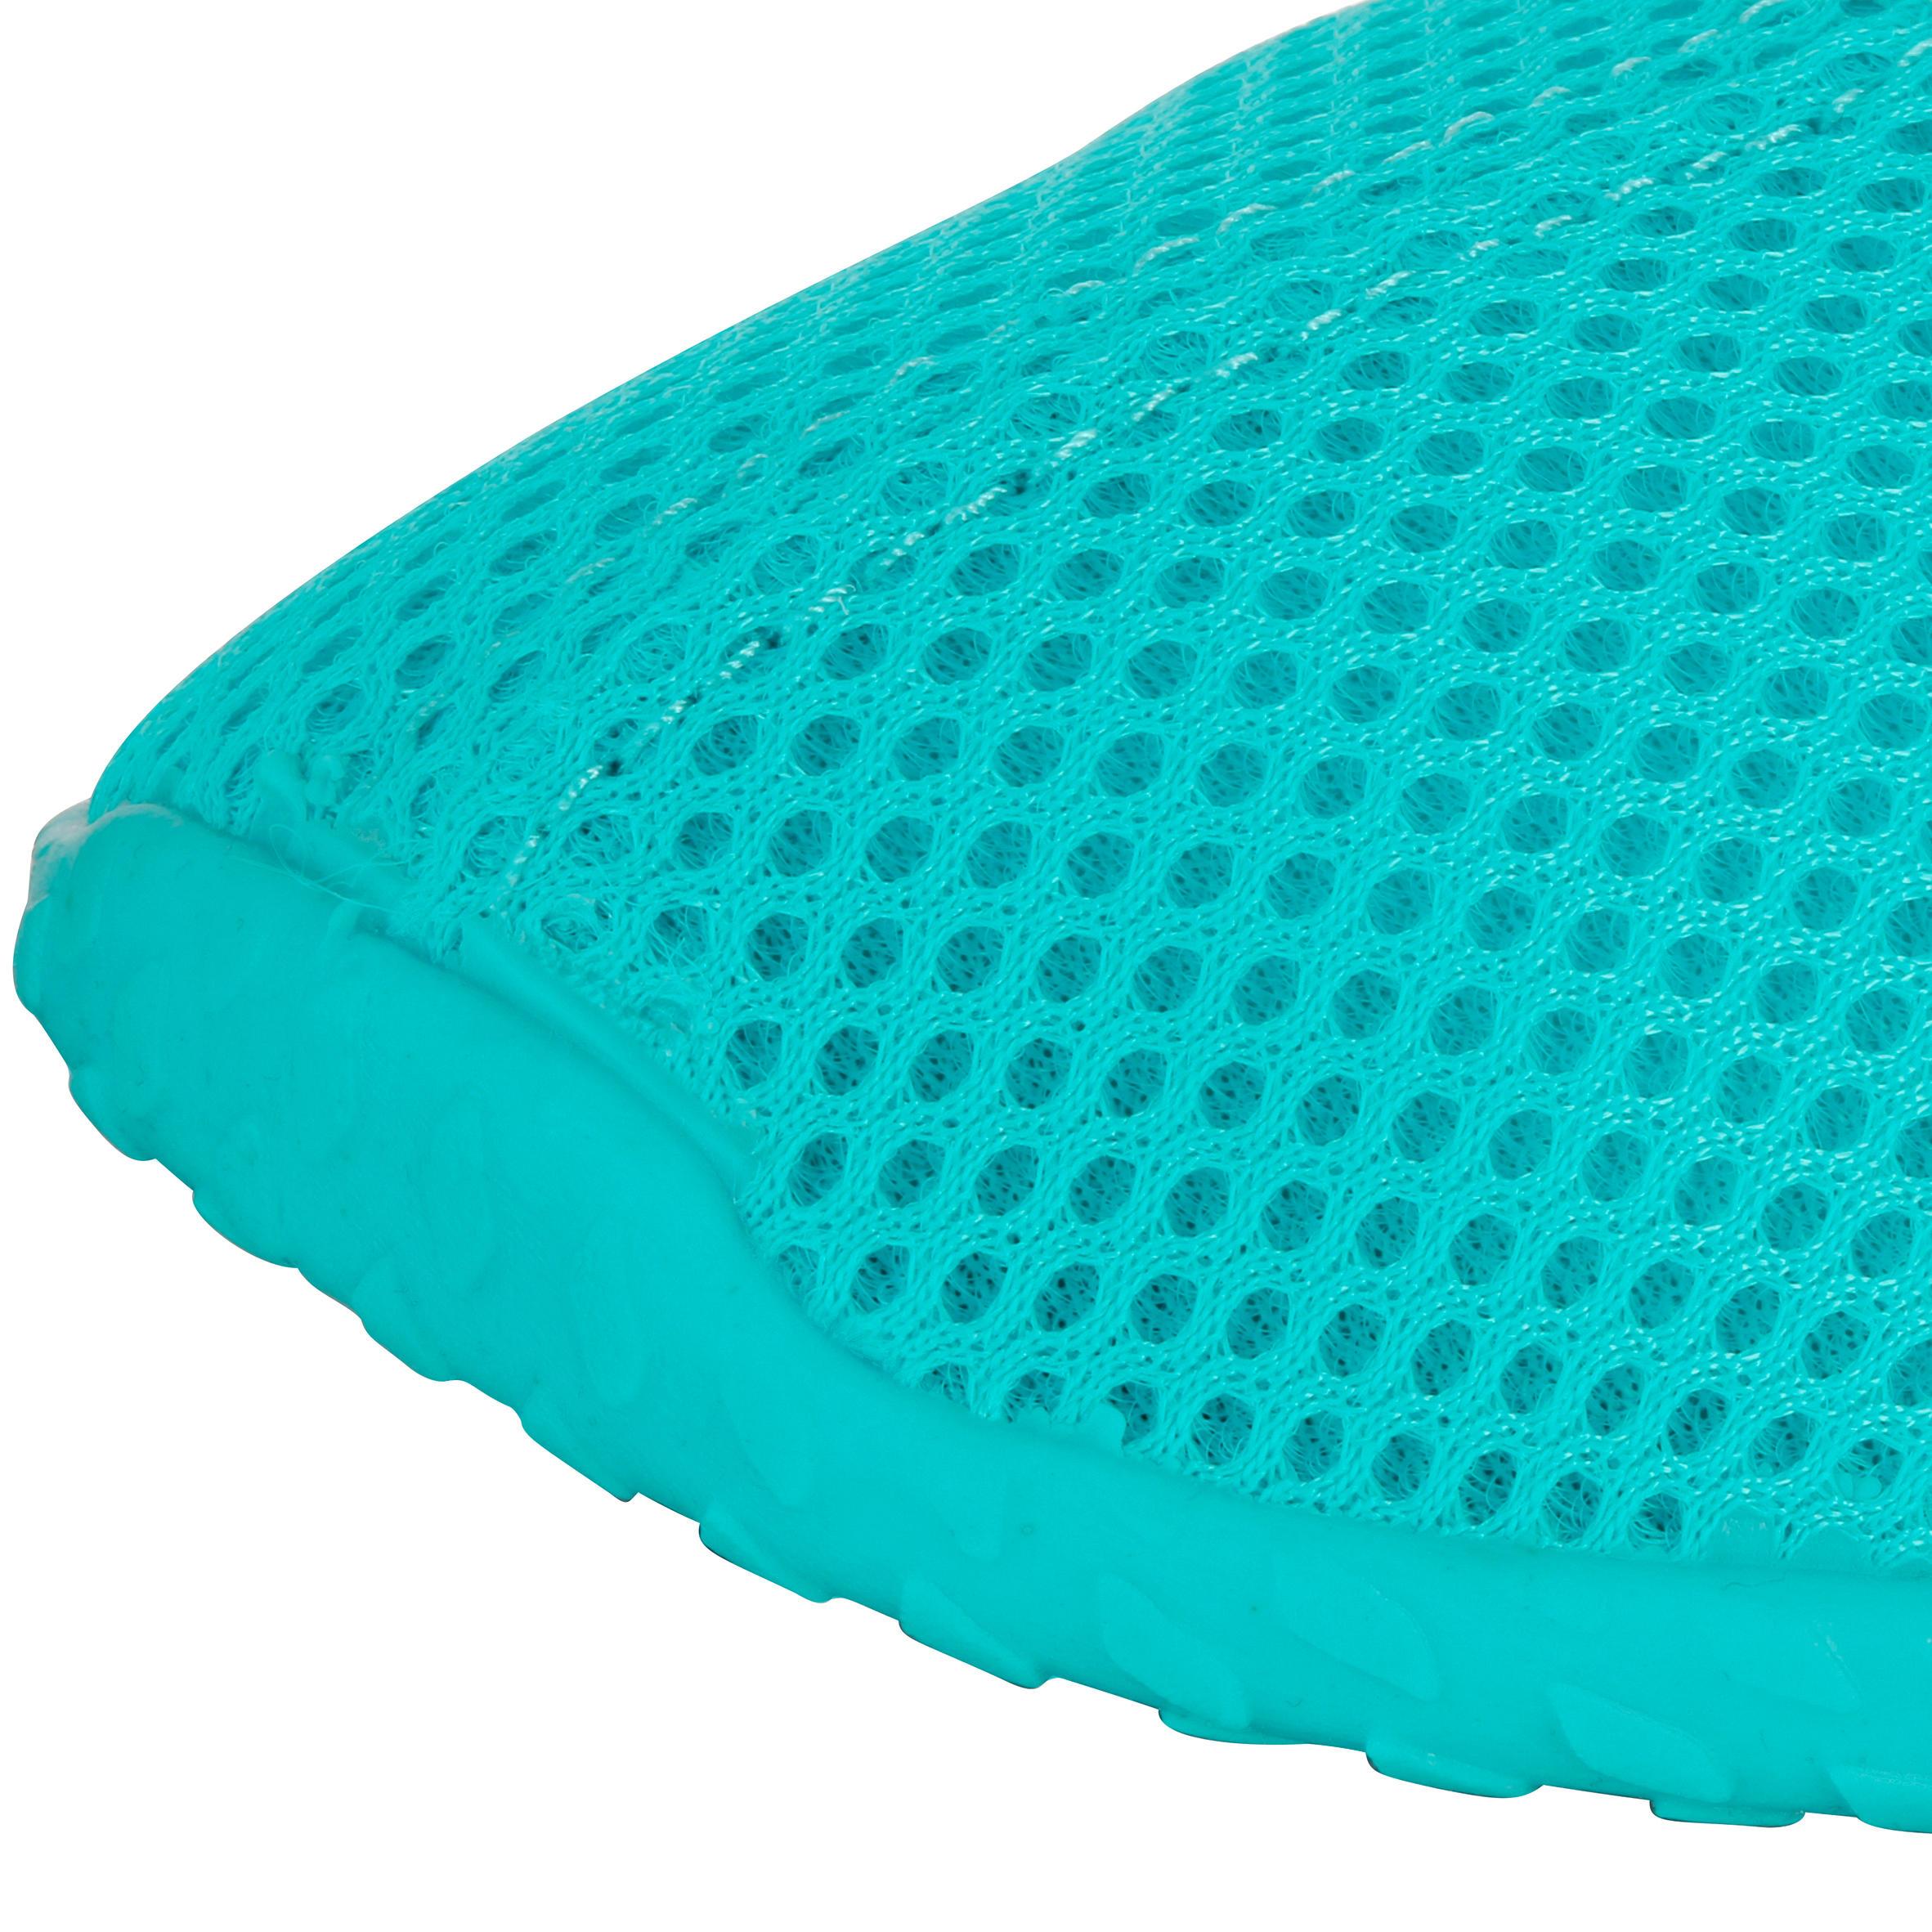 100 Aquashoes - Turquoise